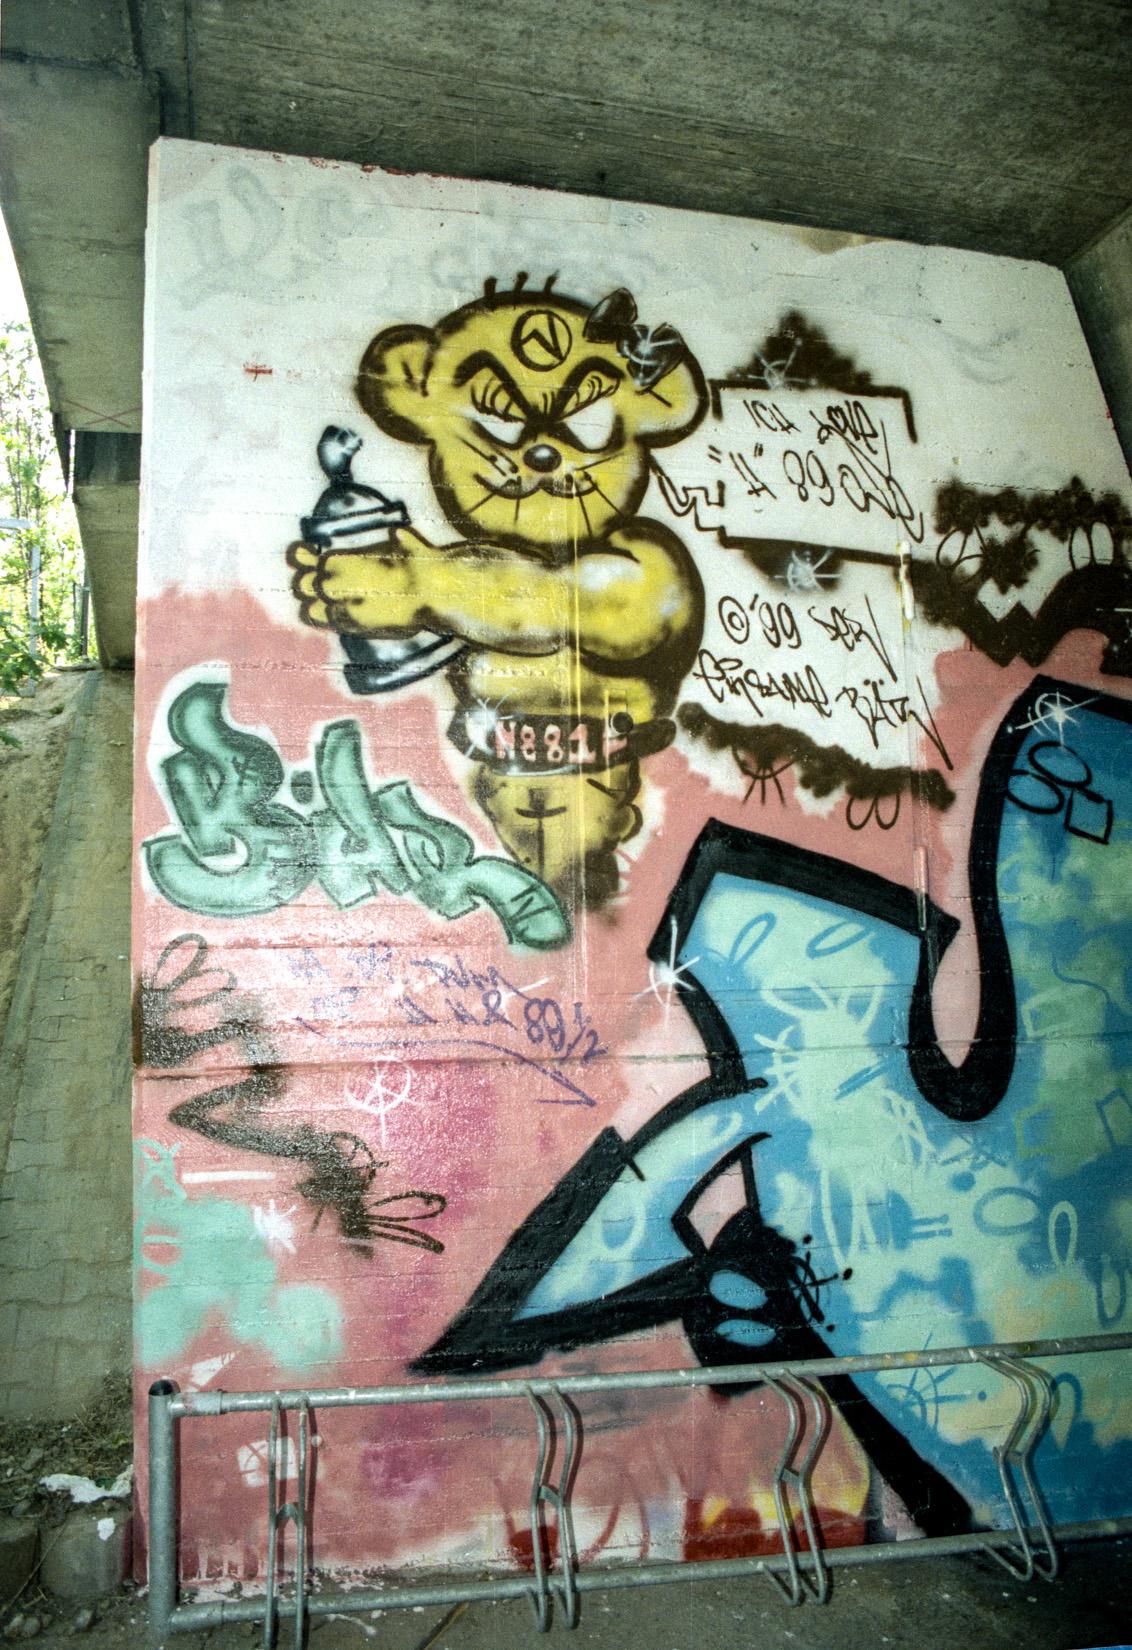 Frankfurt_Graffiti_1988_1989_H88_FRC (6 von 25)